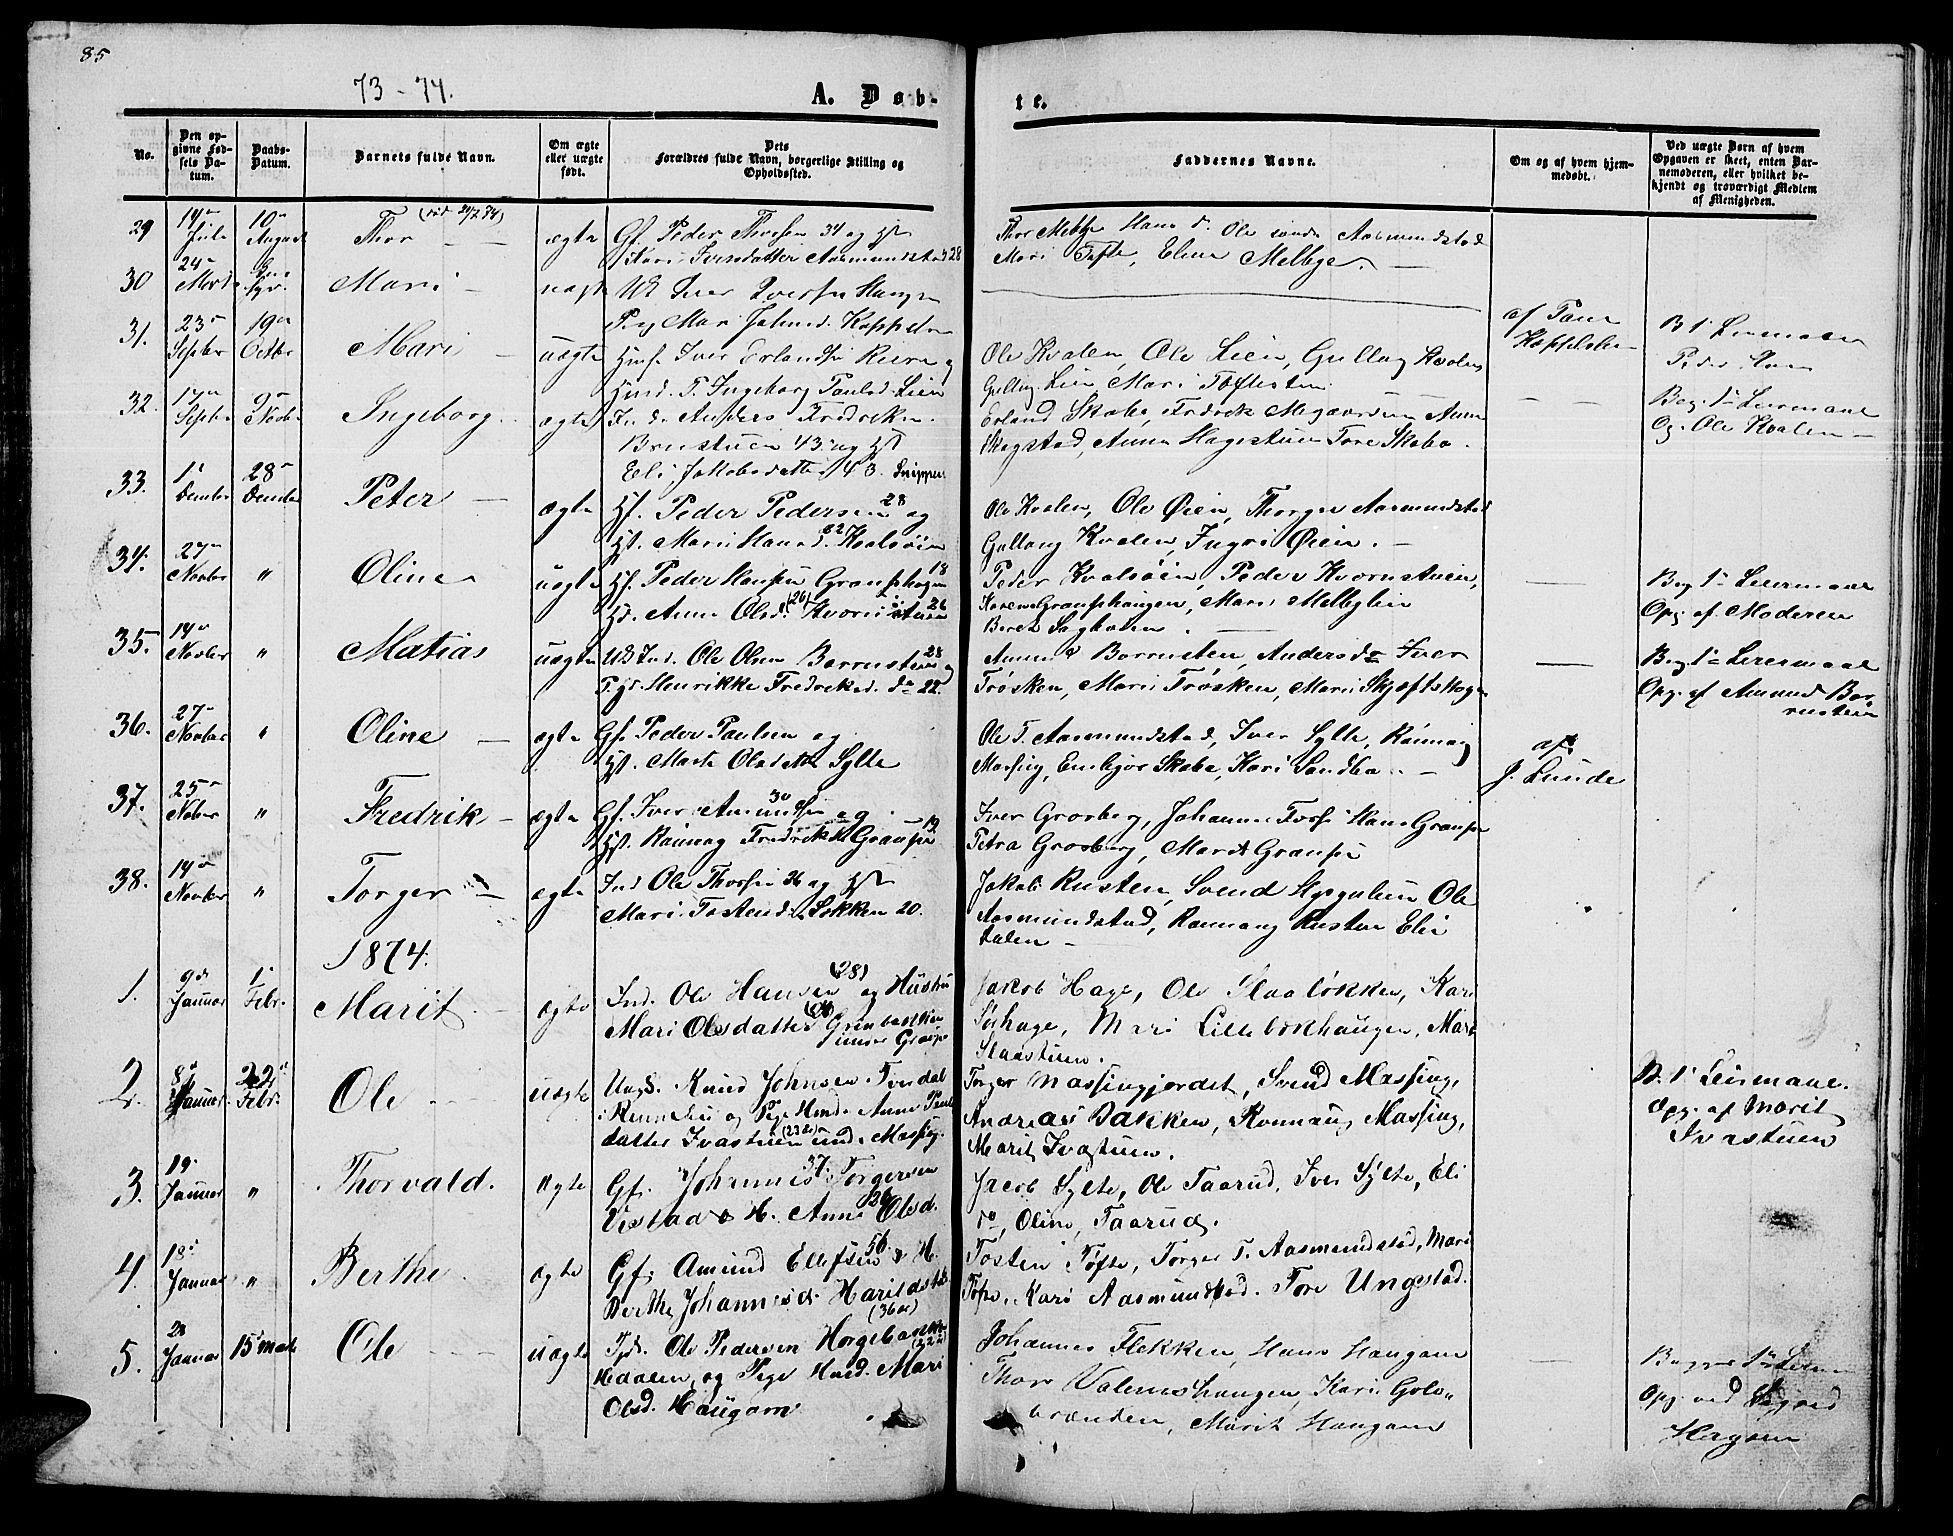 SAH, Nord-Fron prestekontor, Klokkerbok nr. 2, 1851-1883, s. 85